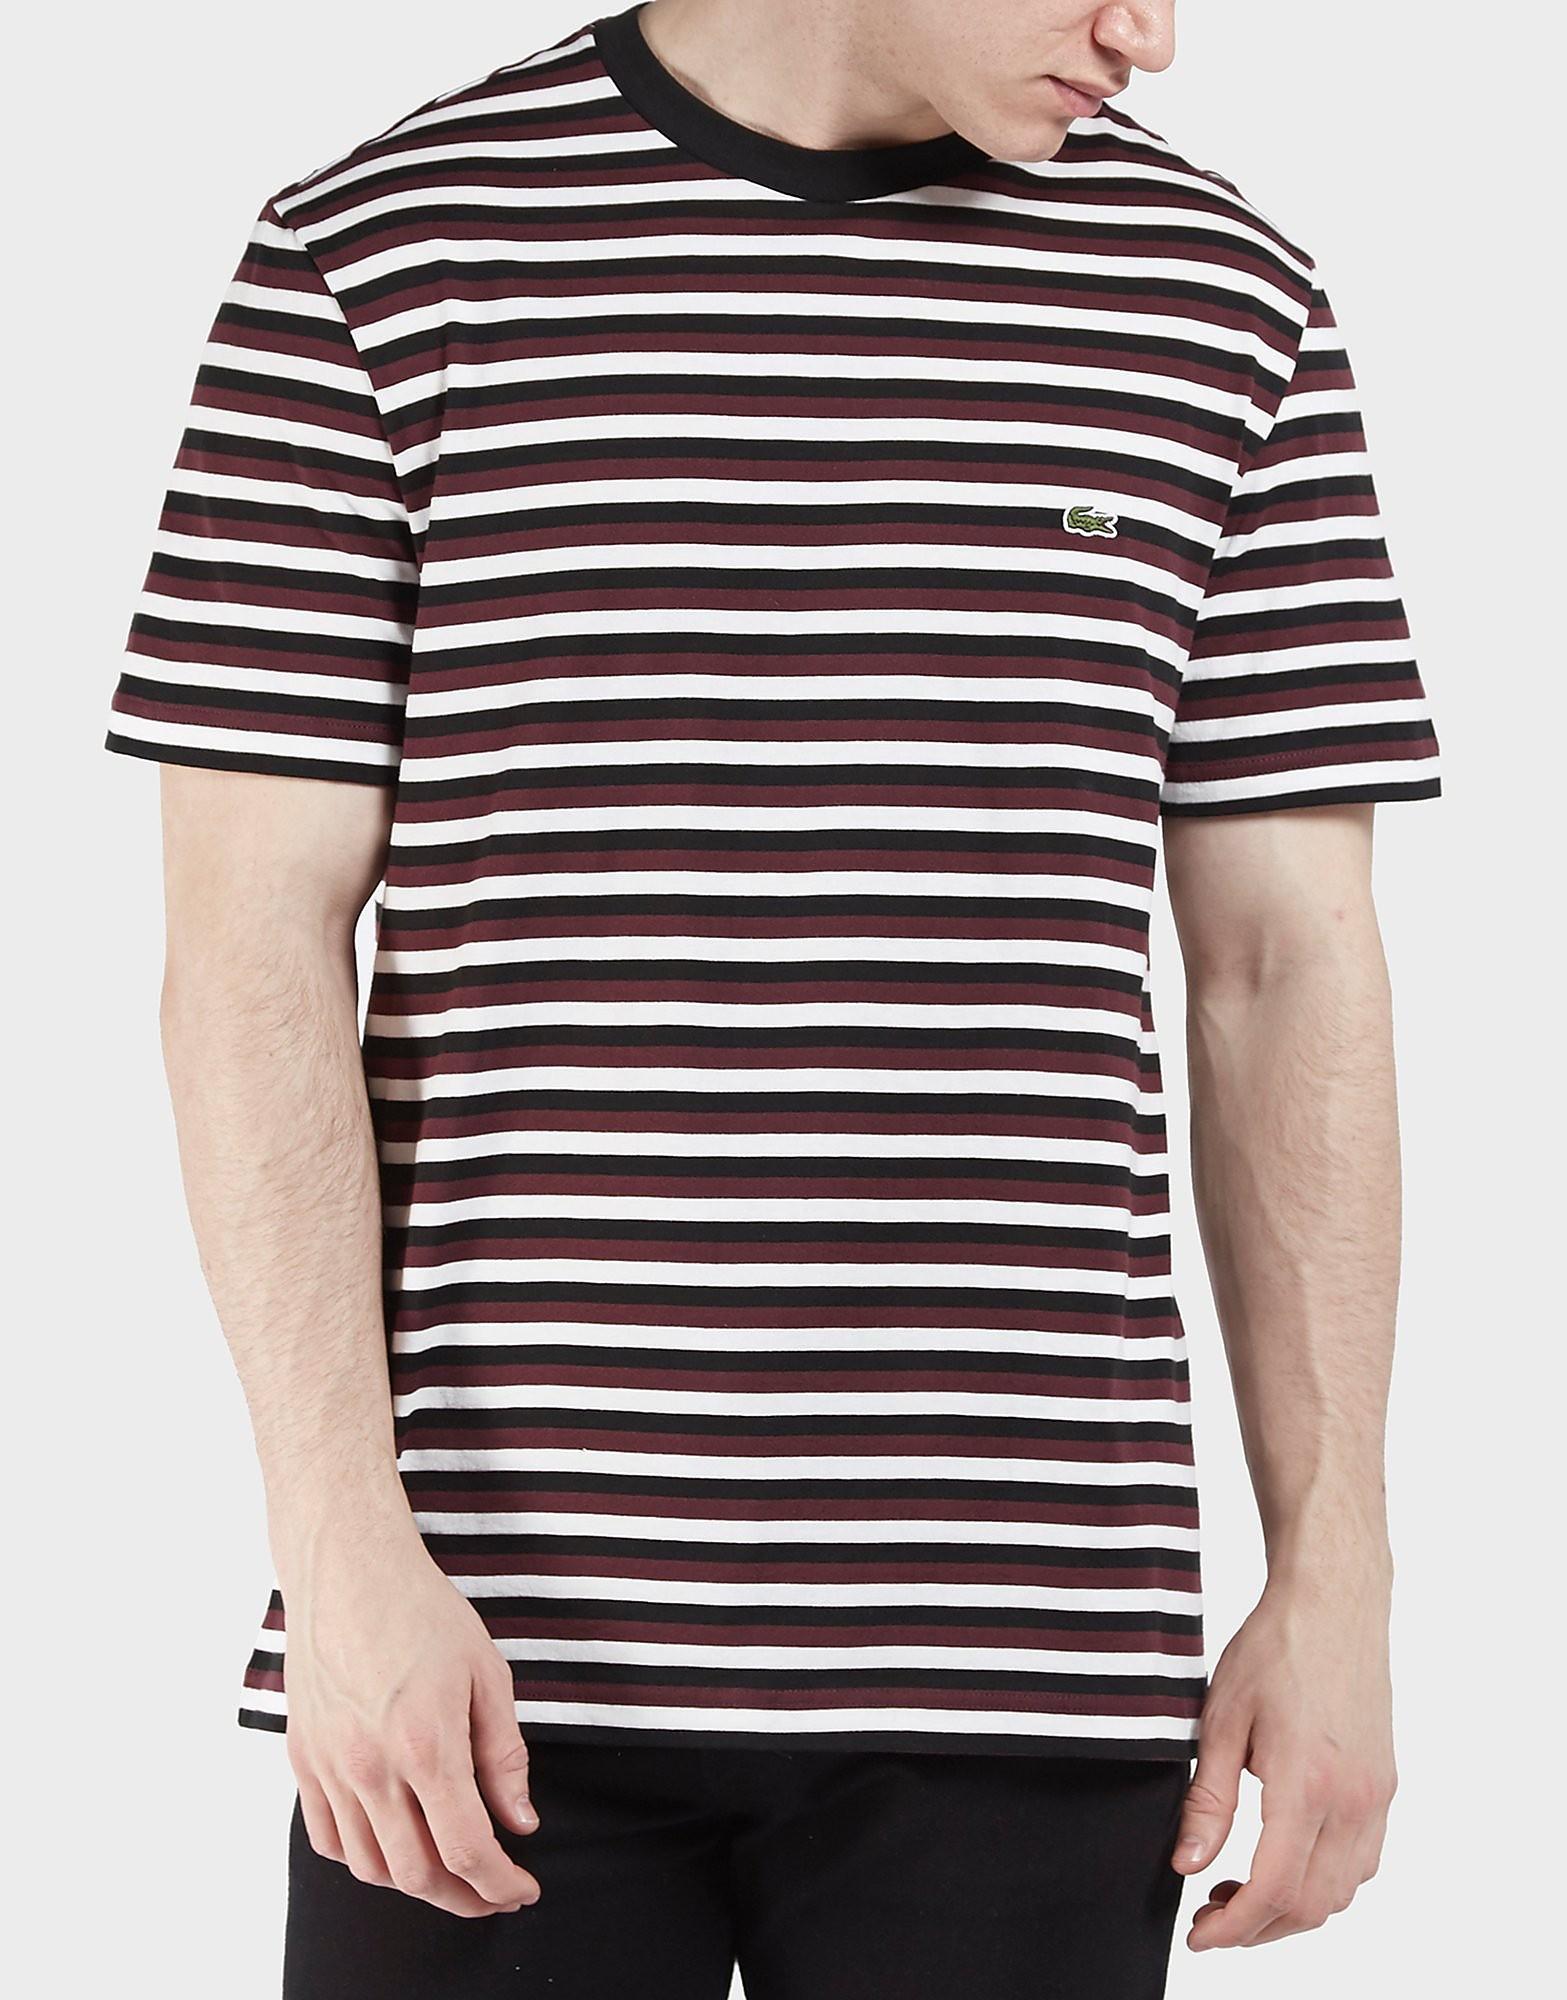 Lacoste Multi Stripe Short Sleeve T-Shirt